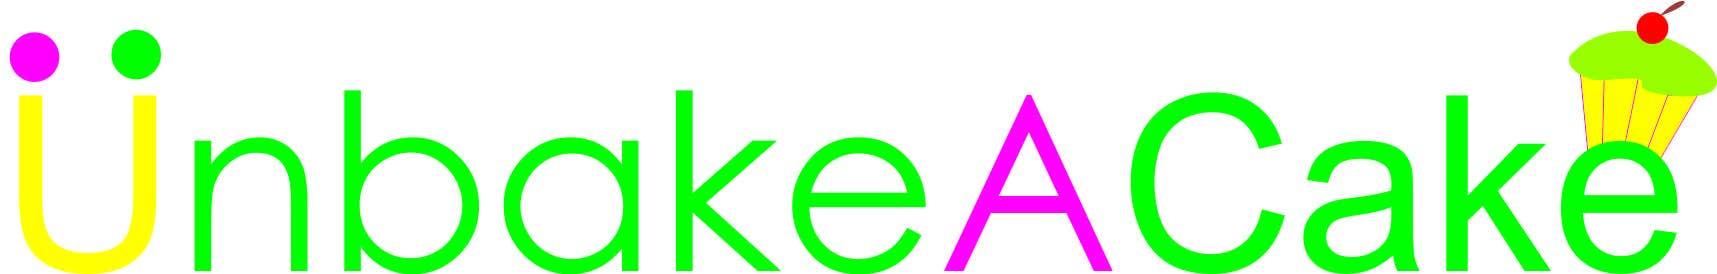 Bài tham dự cuộc thi #                                        29                                      cho                                         Design a Logo for raw organic deserts shop